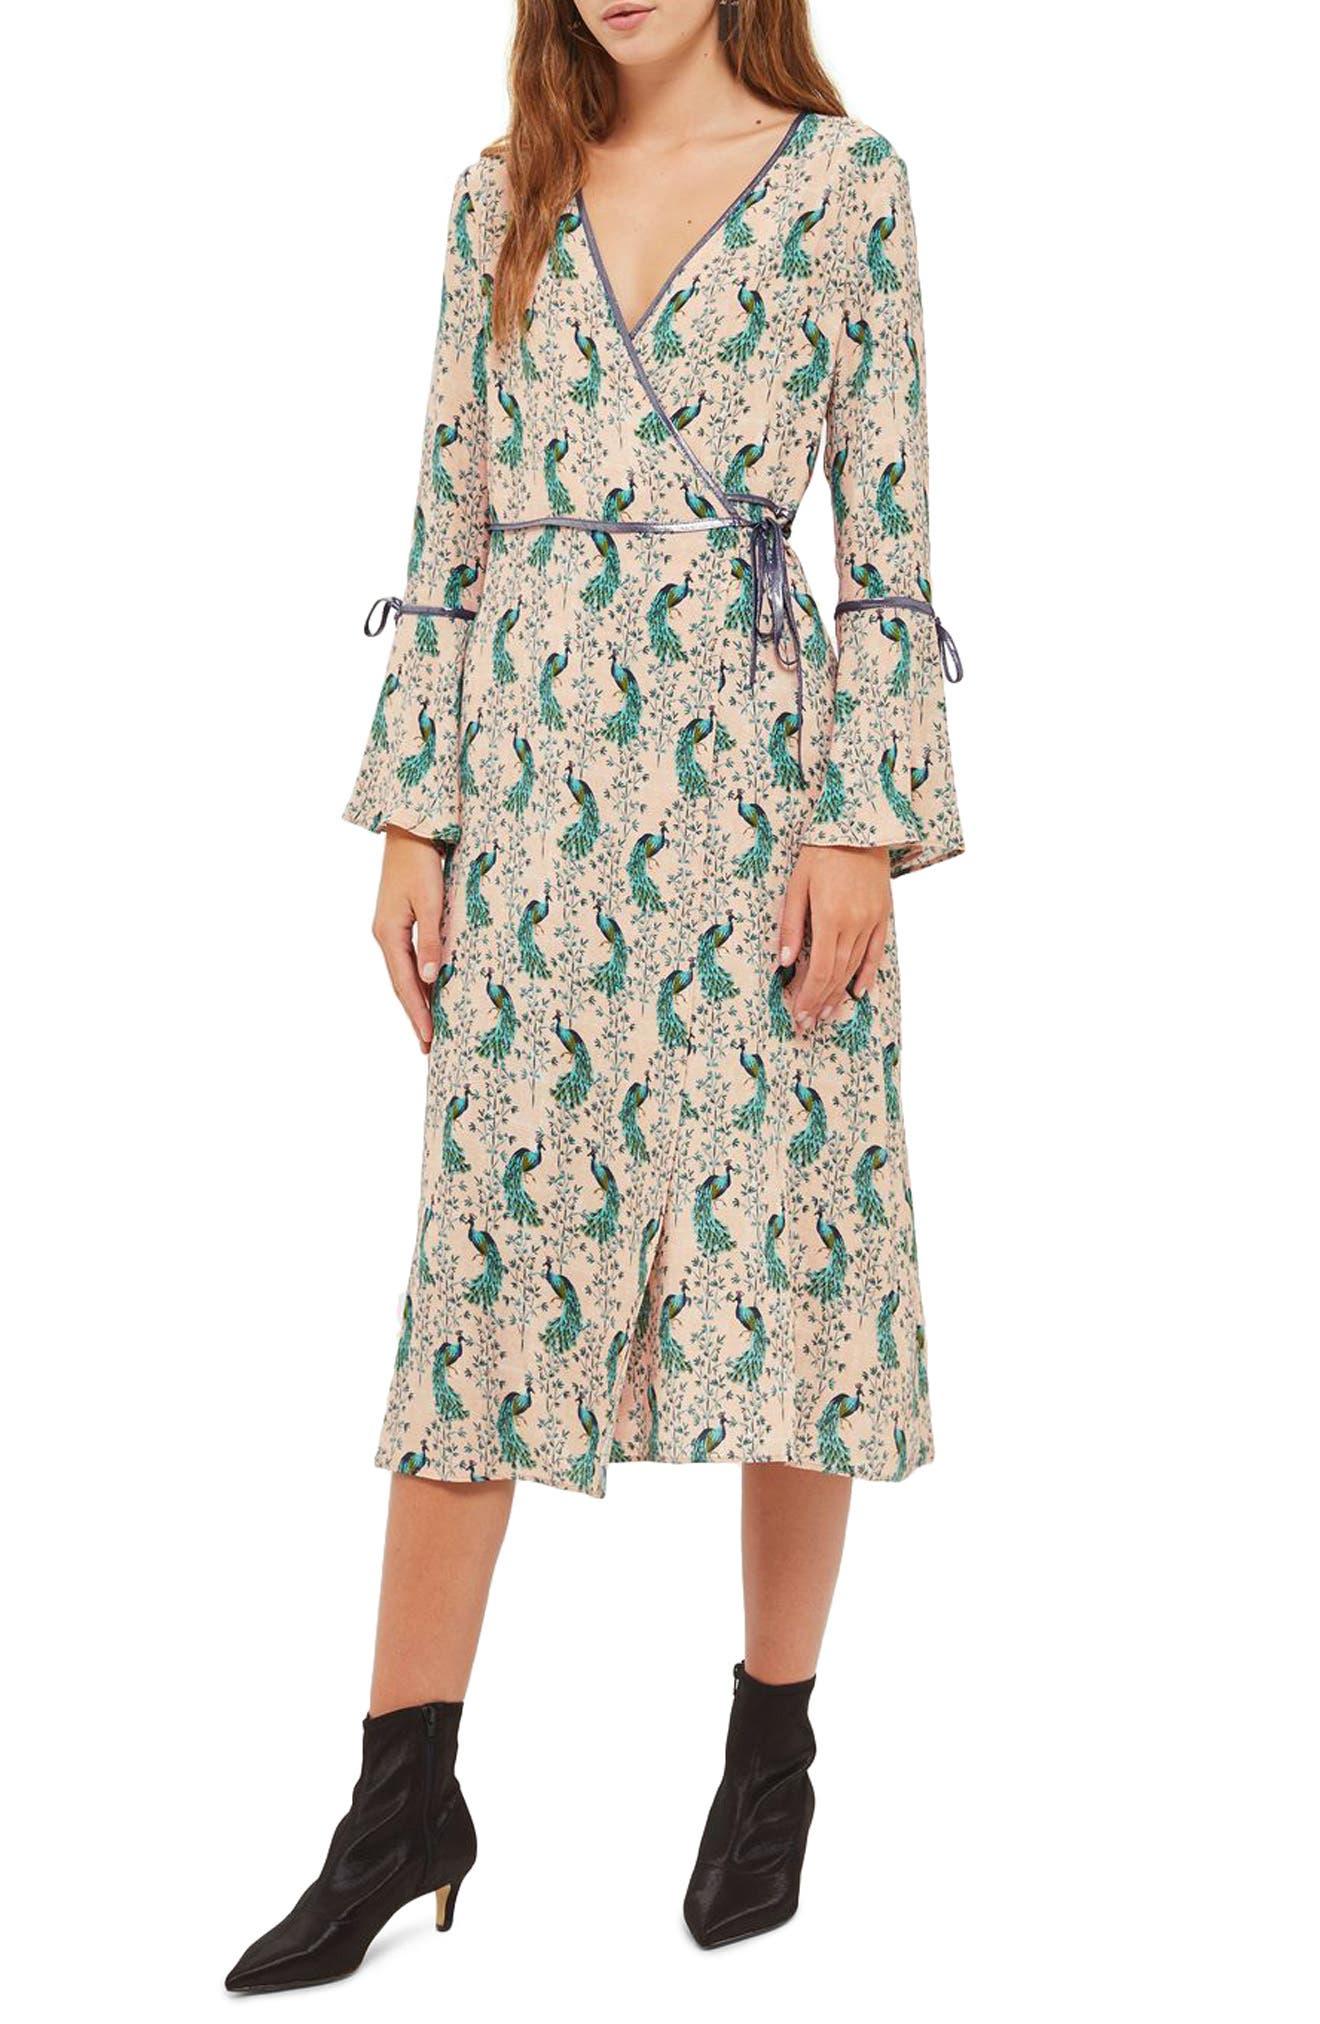 Topshop Peacock Midi Wrap Dress